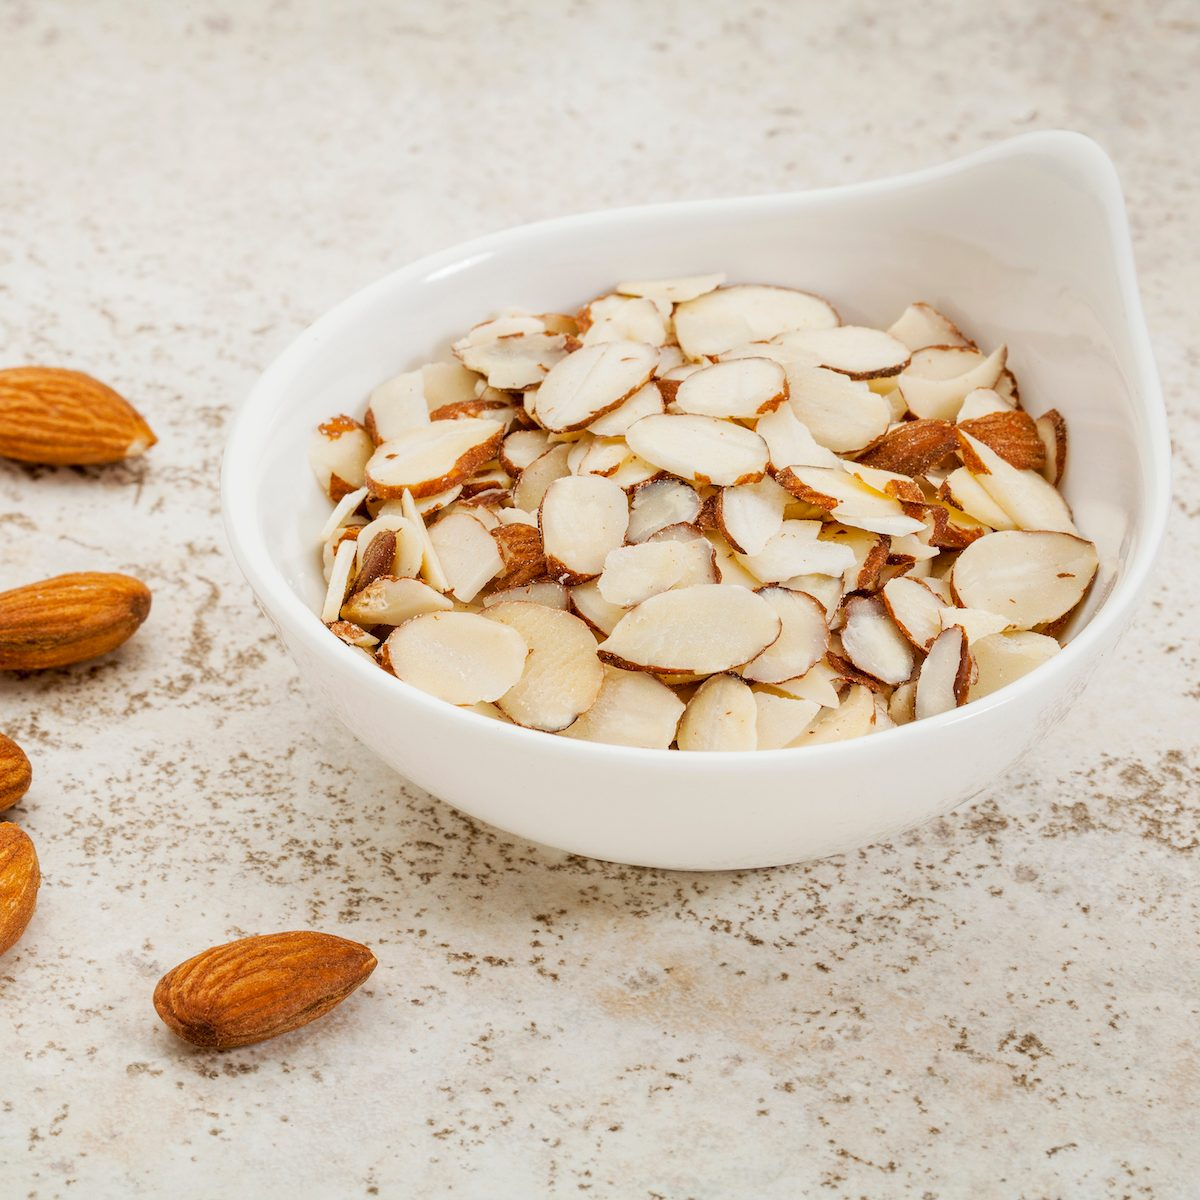 small ceramic bowl of sliced raw almonds